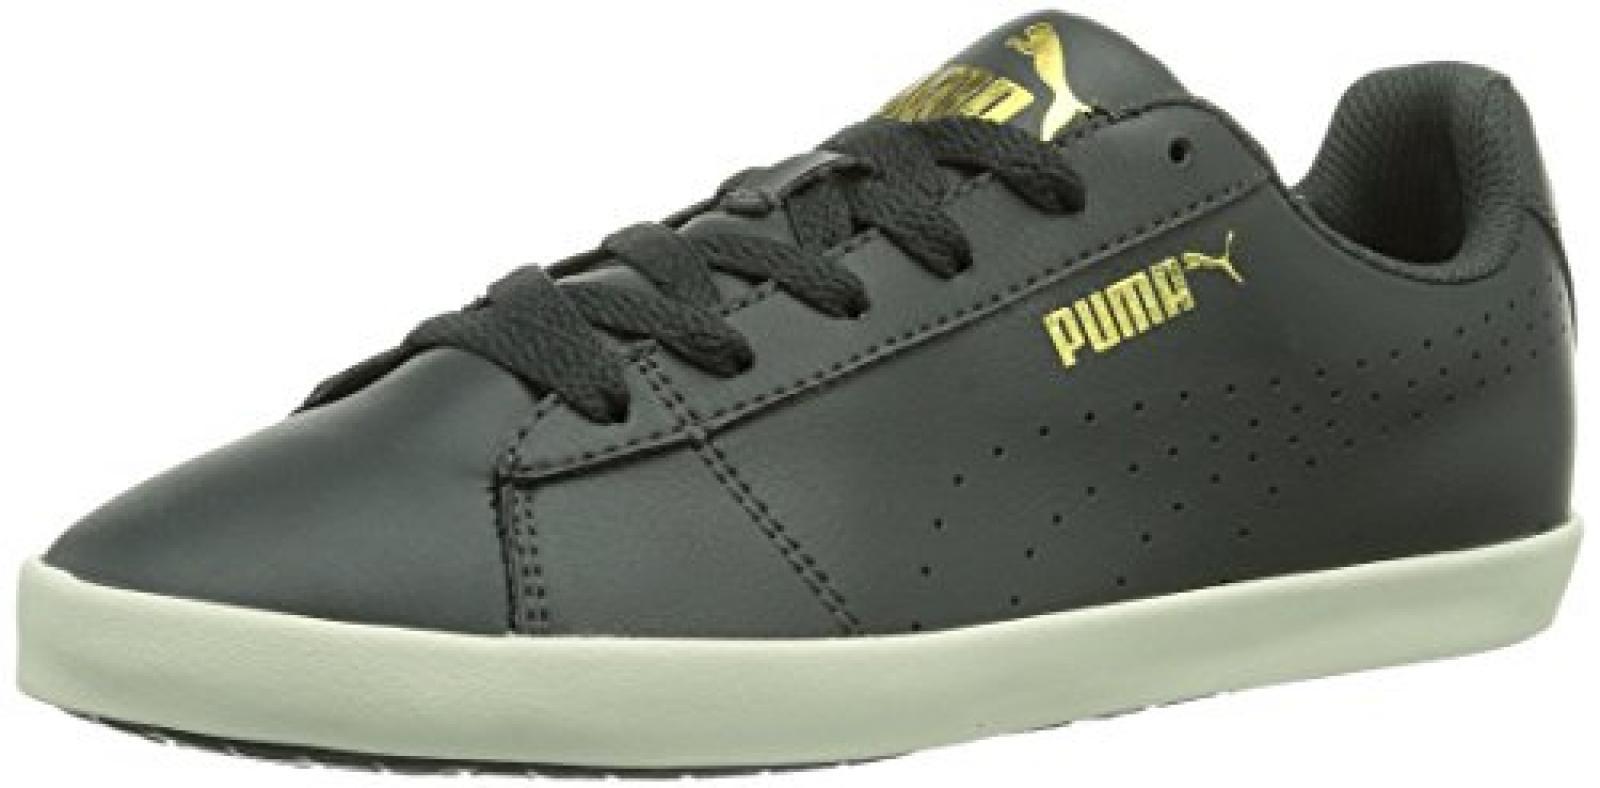 Puma Civilian SL Unisex-Erwachsene Sneakers